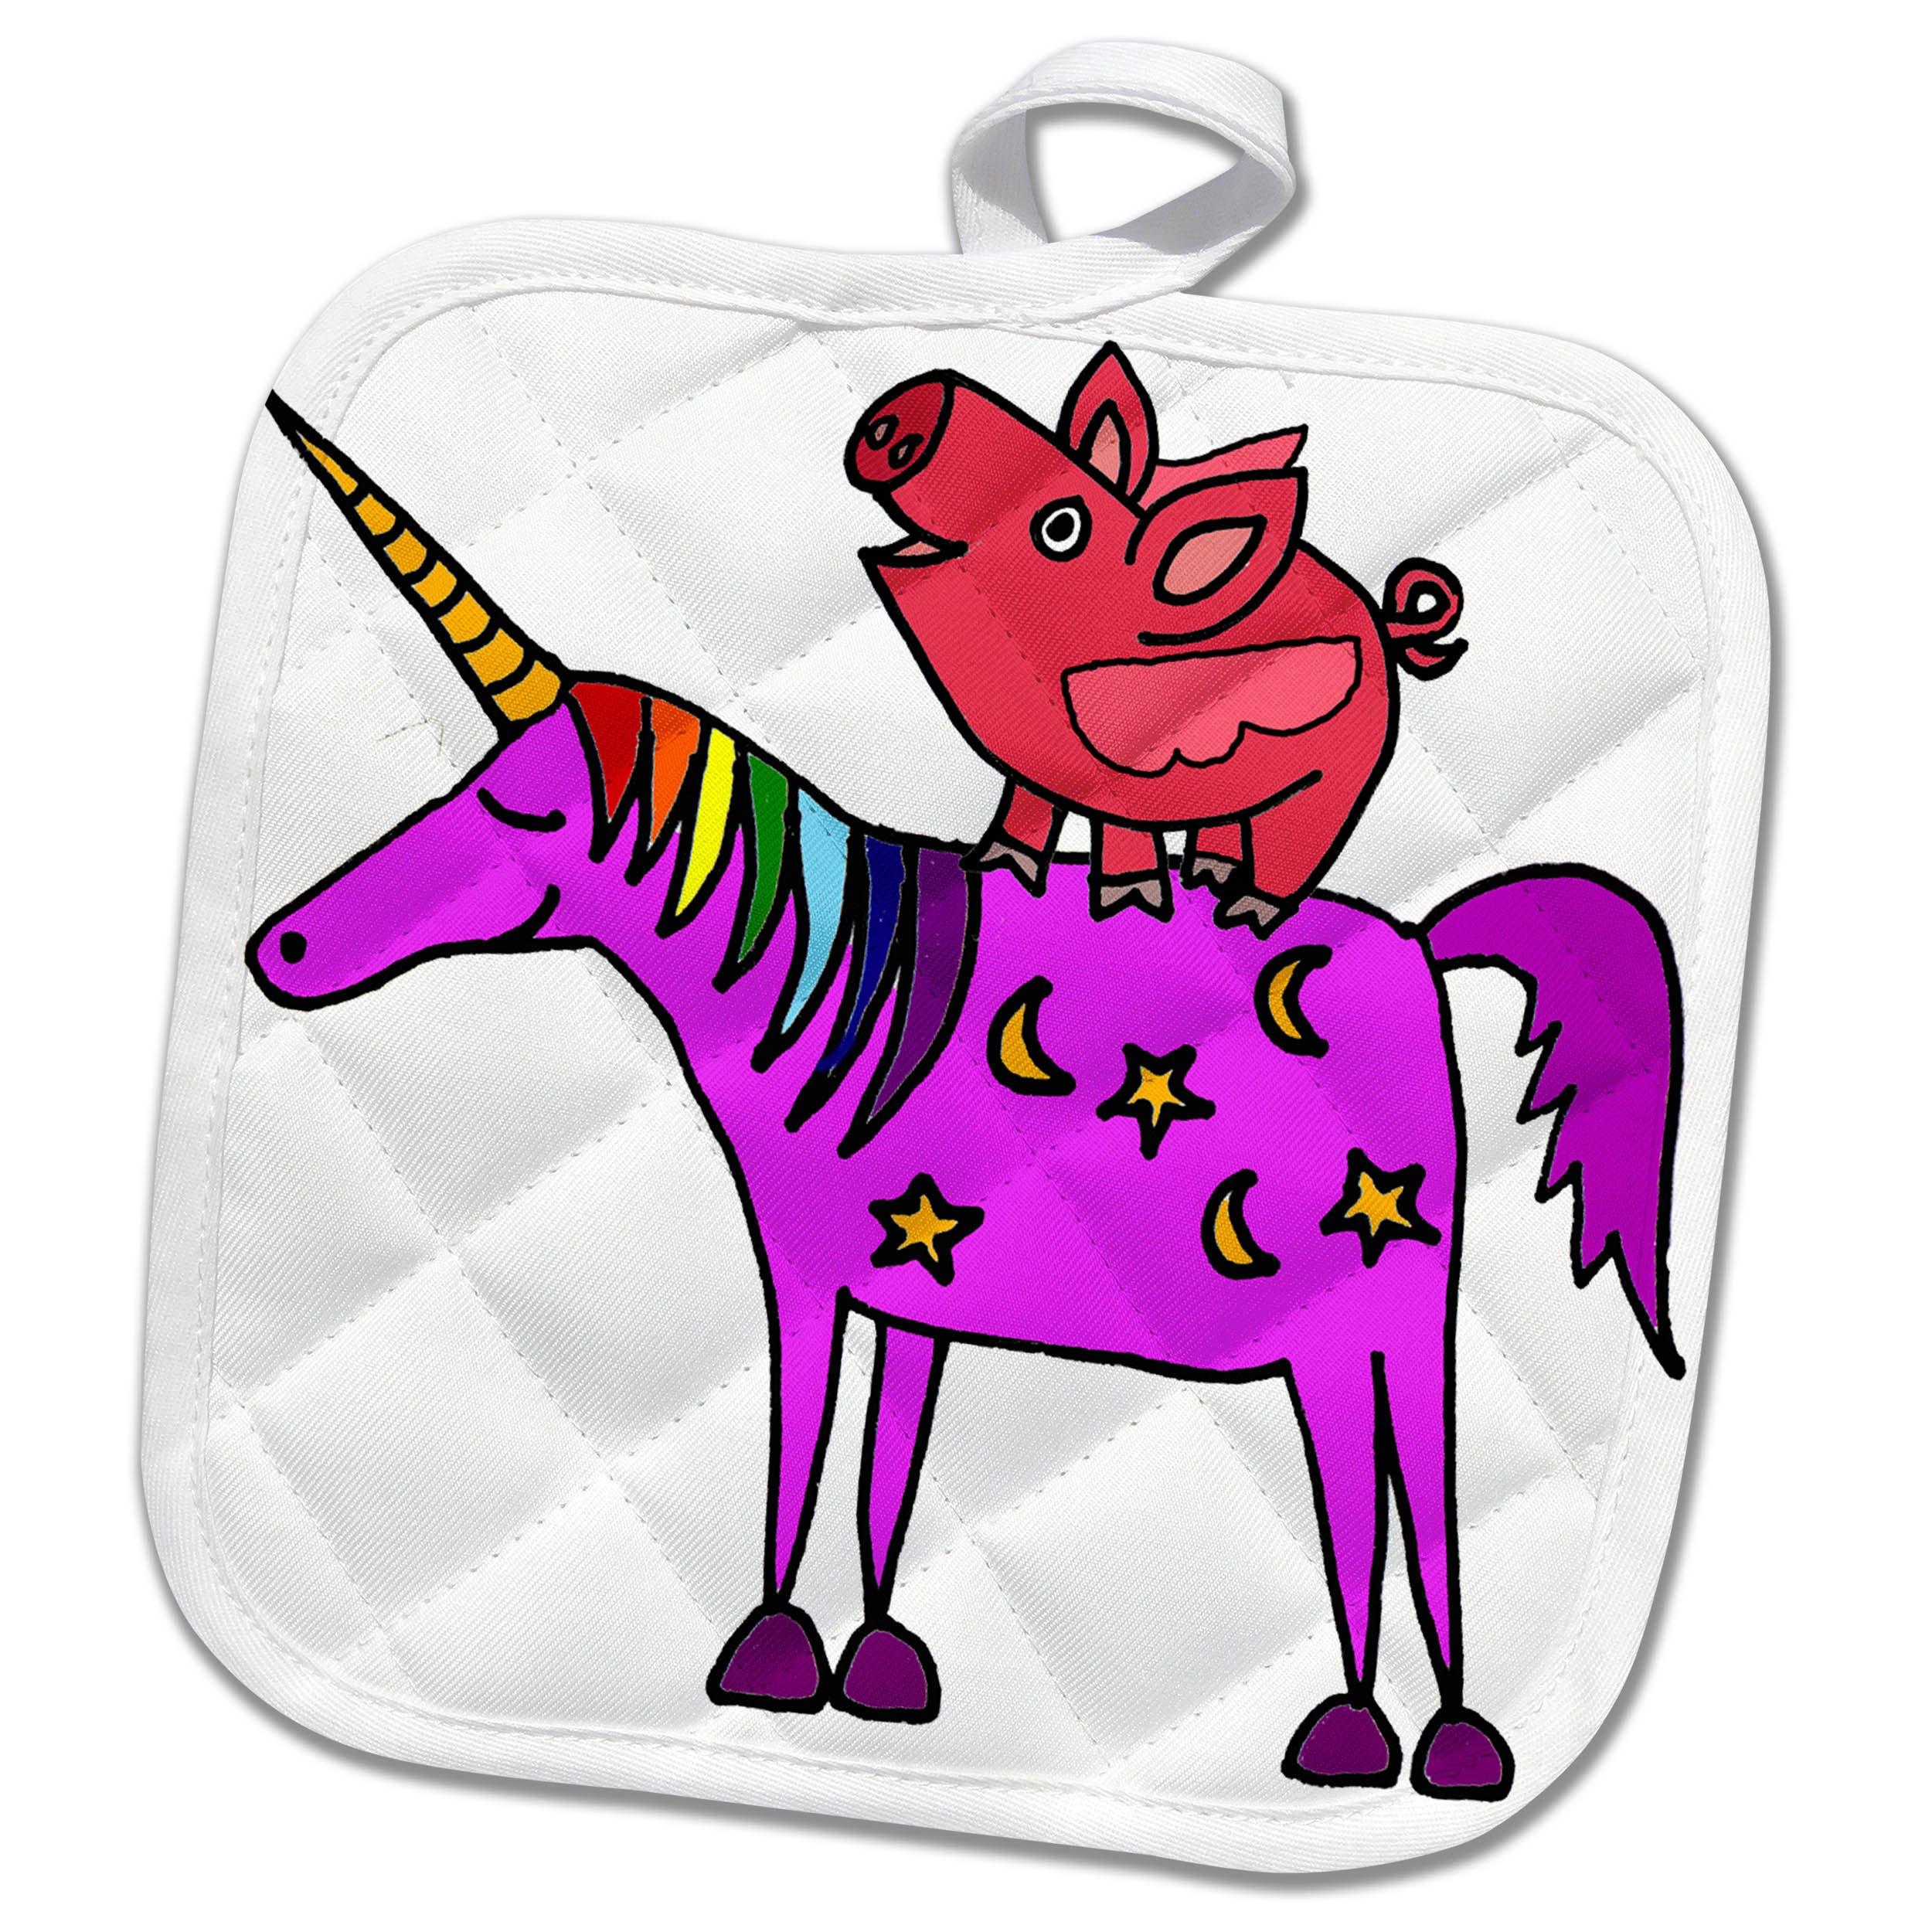 3dRose Funny Cool Flying Pig Riding Unicorn Cartoon Pot Holder,